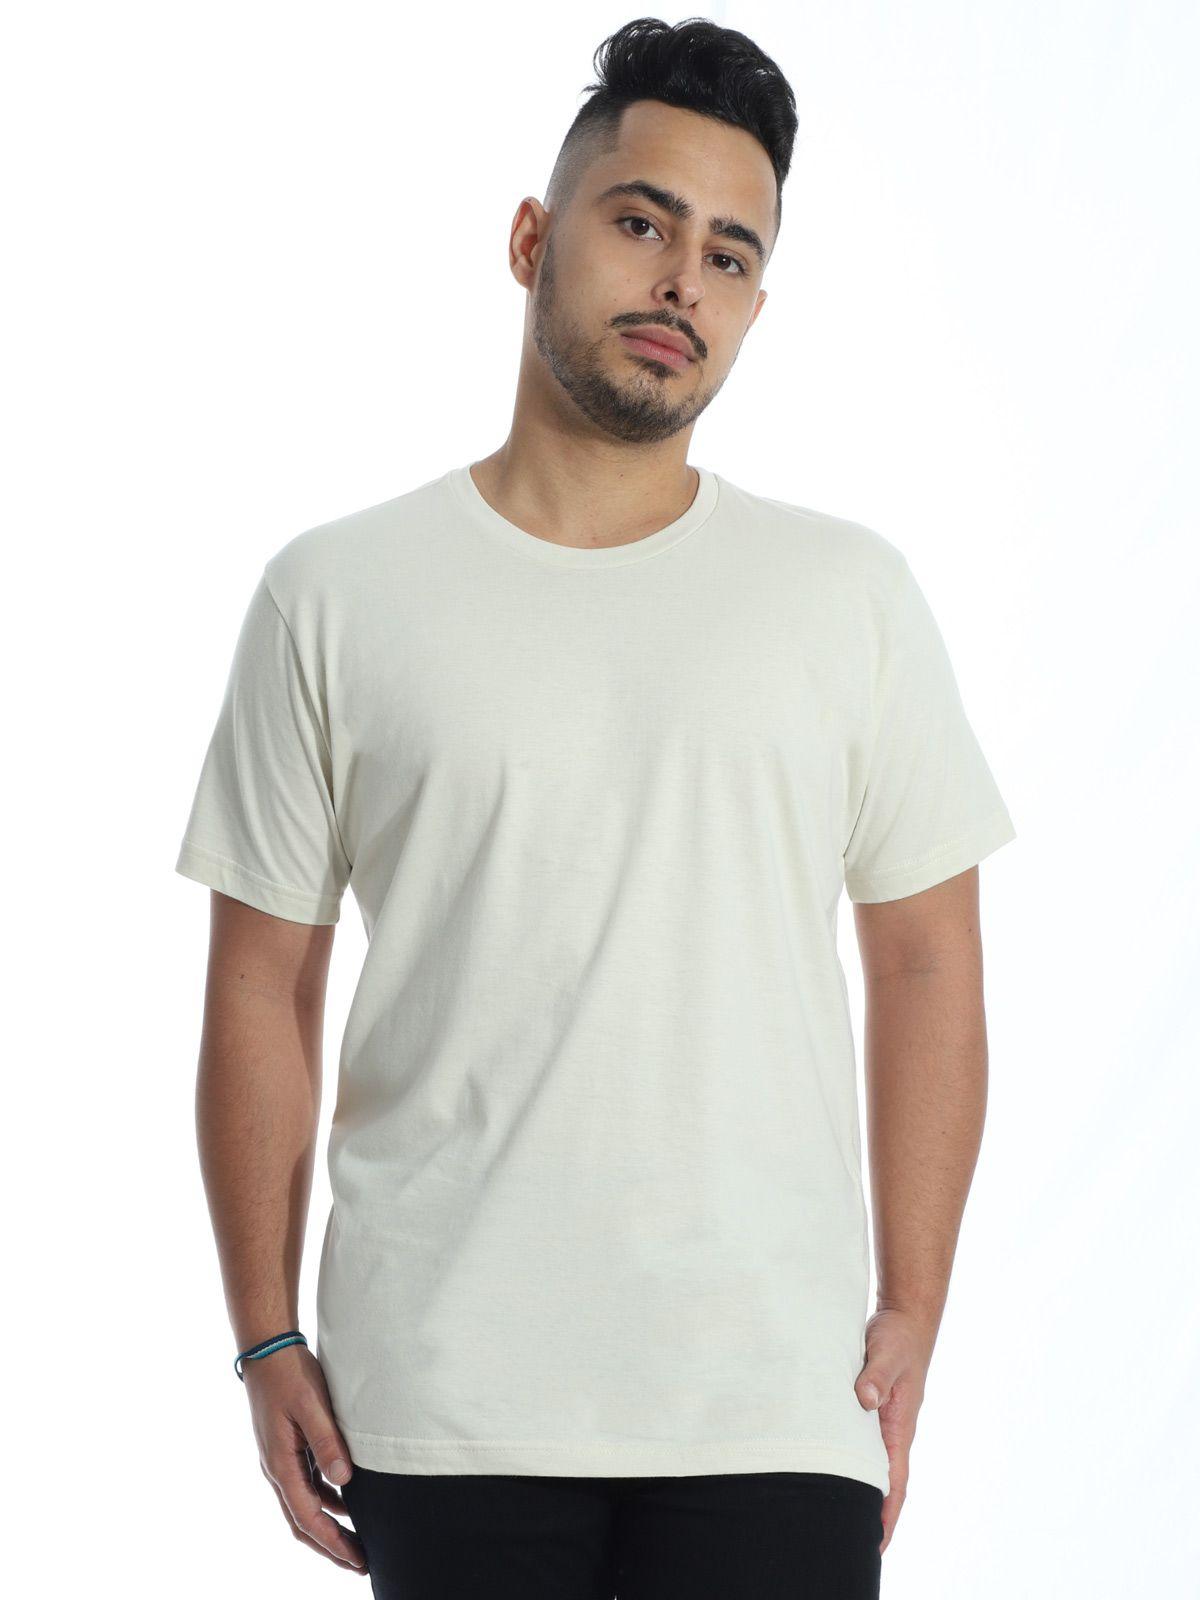 Camiseta Masculina Básica Lisa Areia